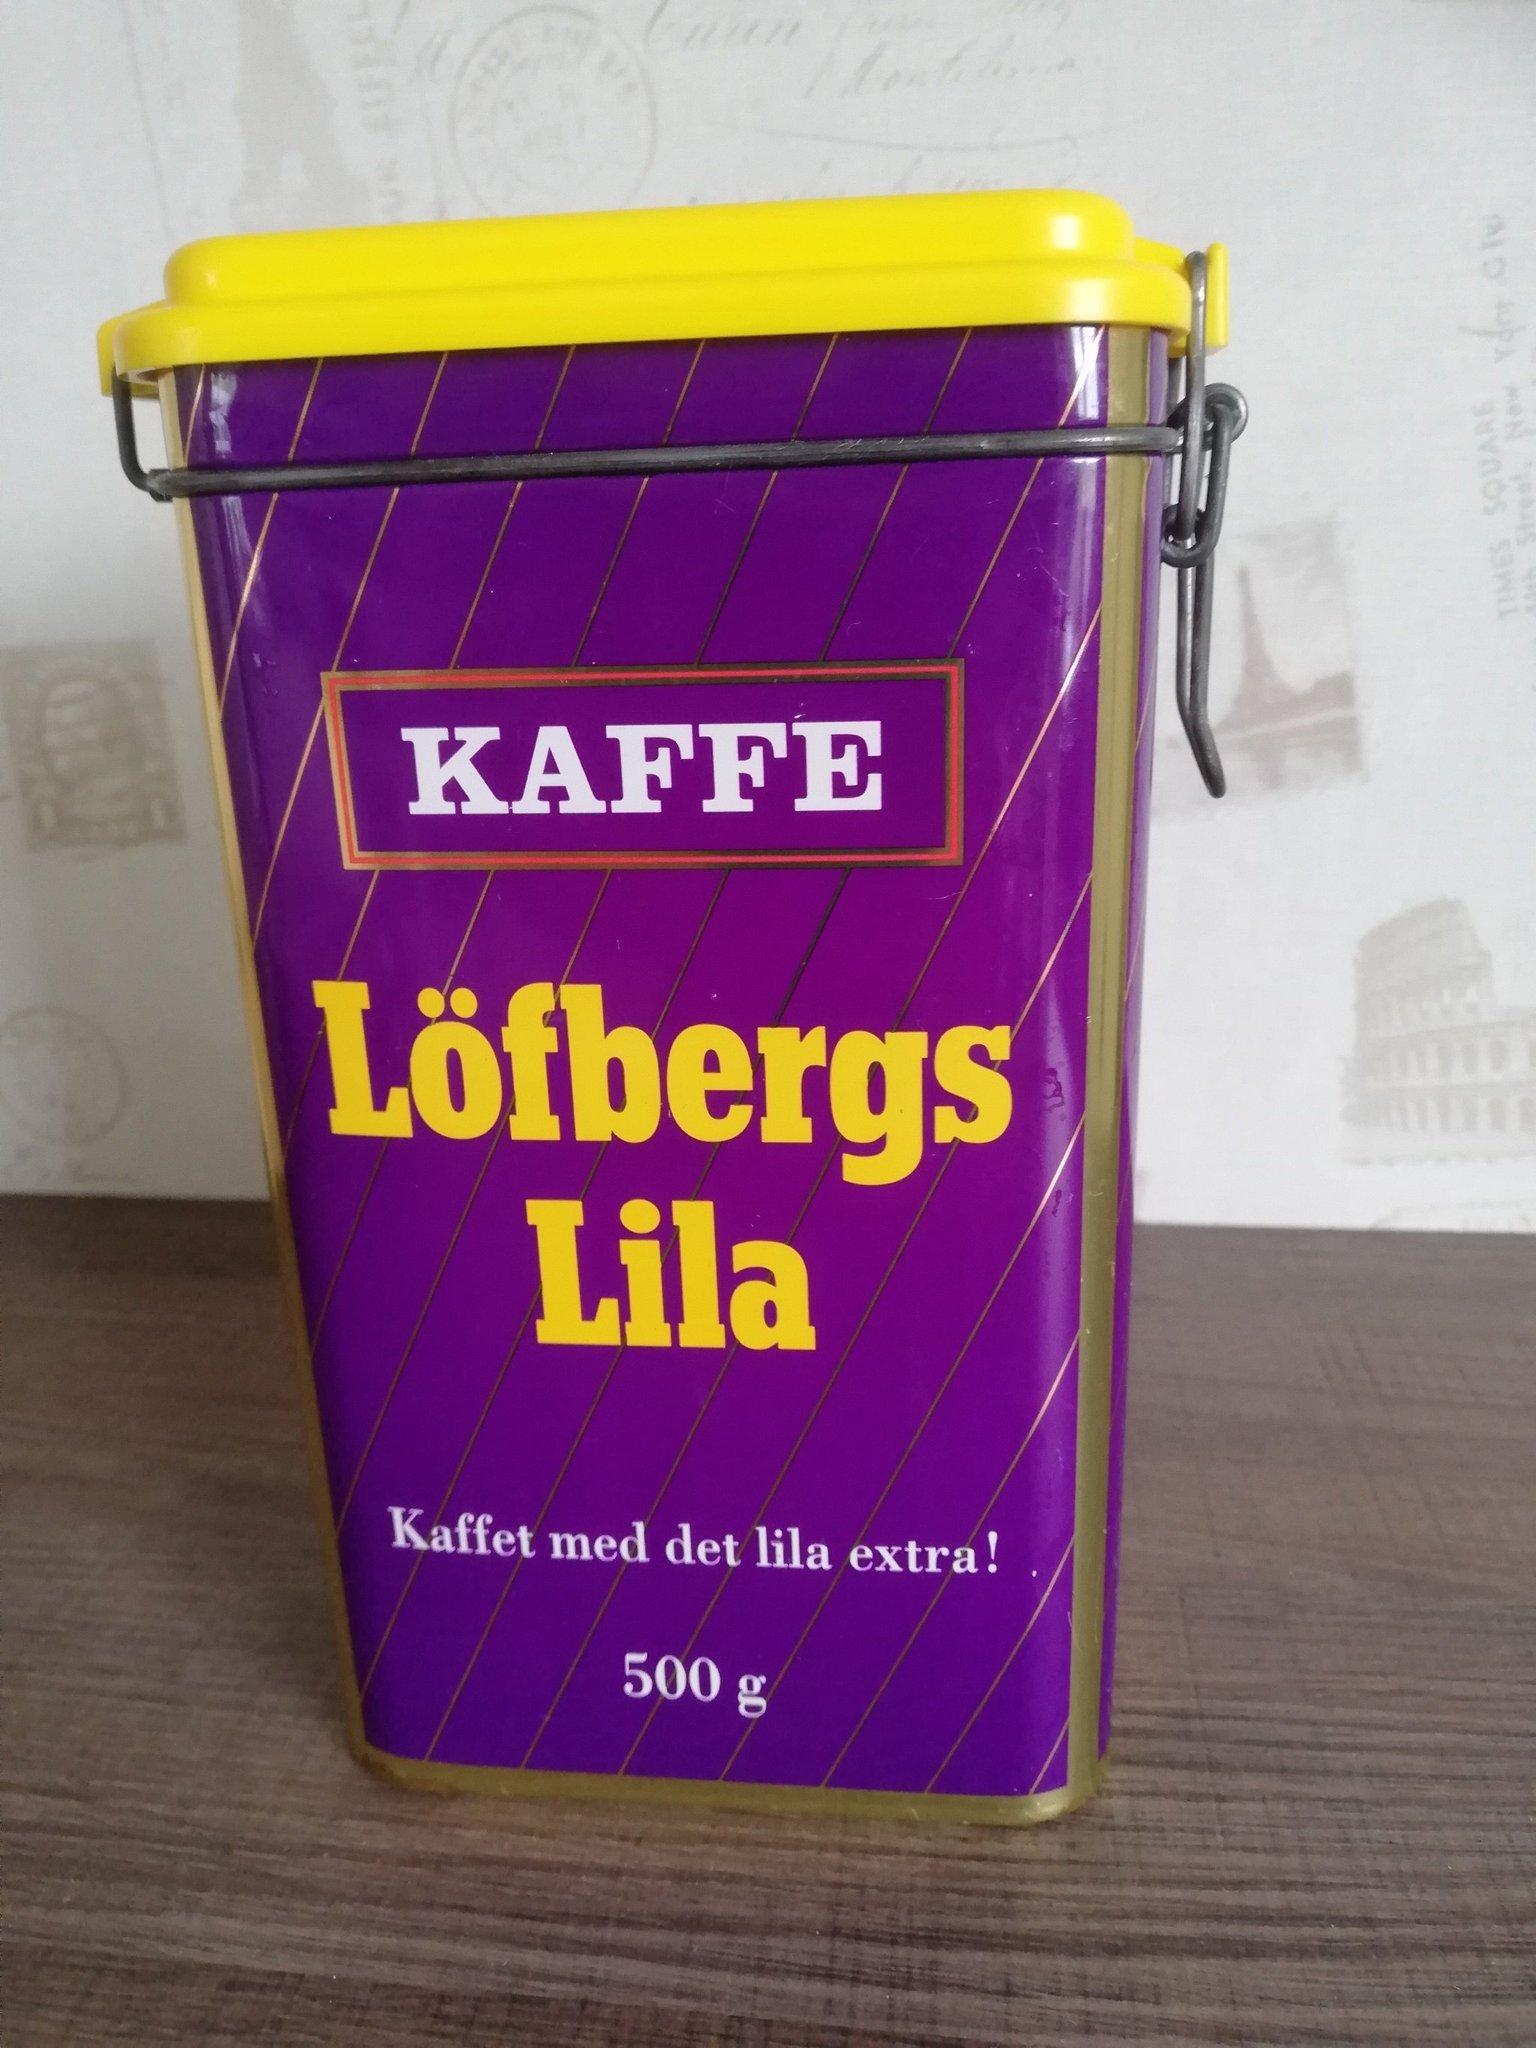 löfbergs lila rabattkod